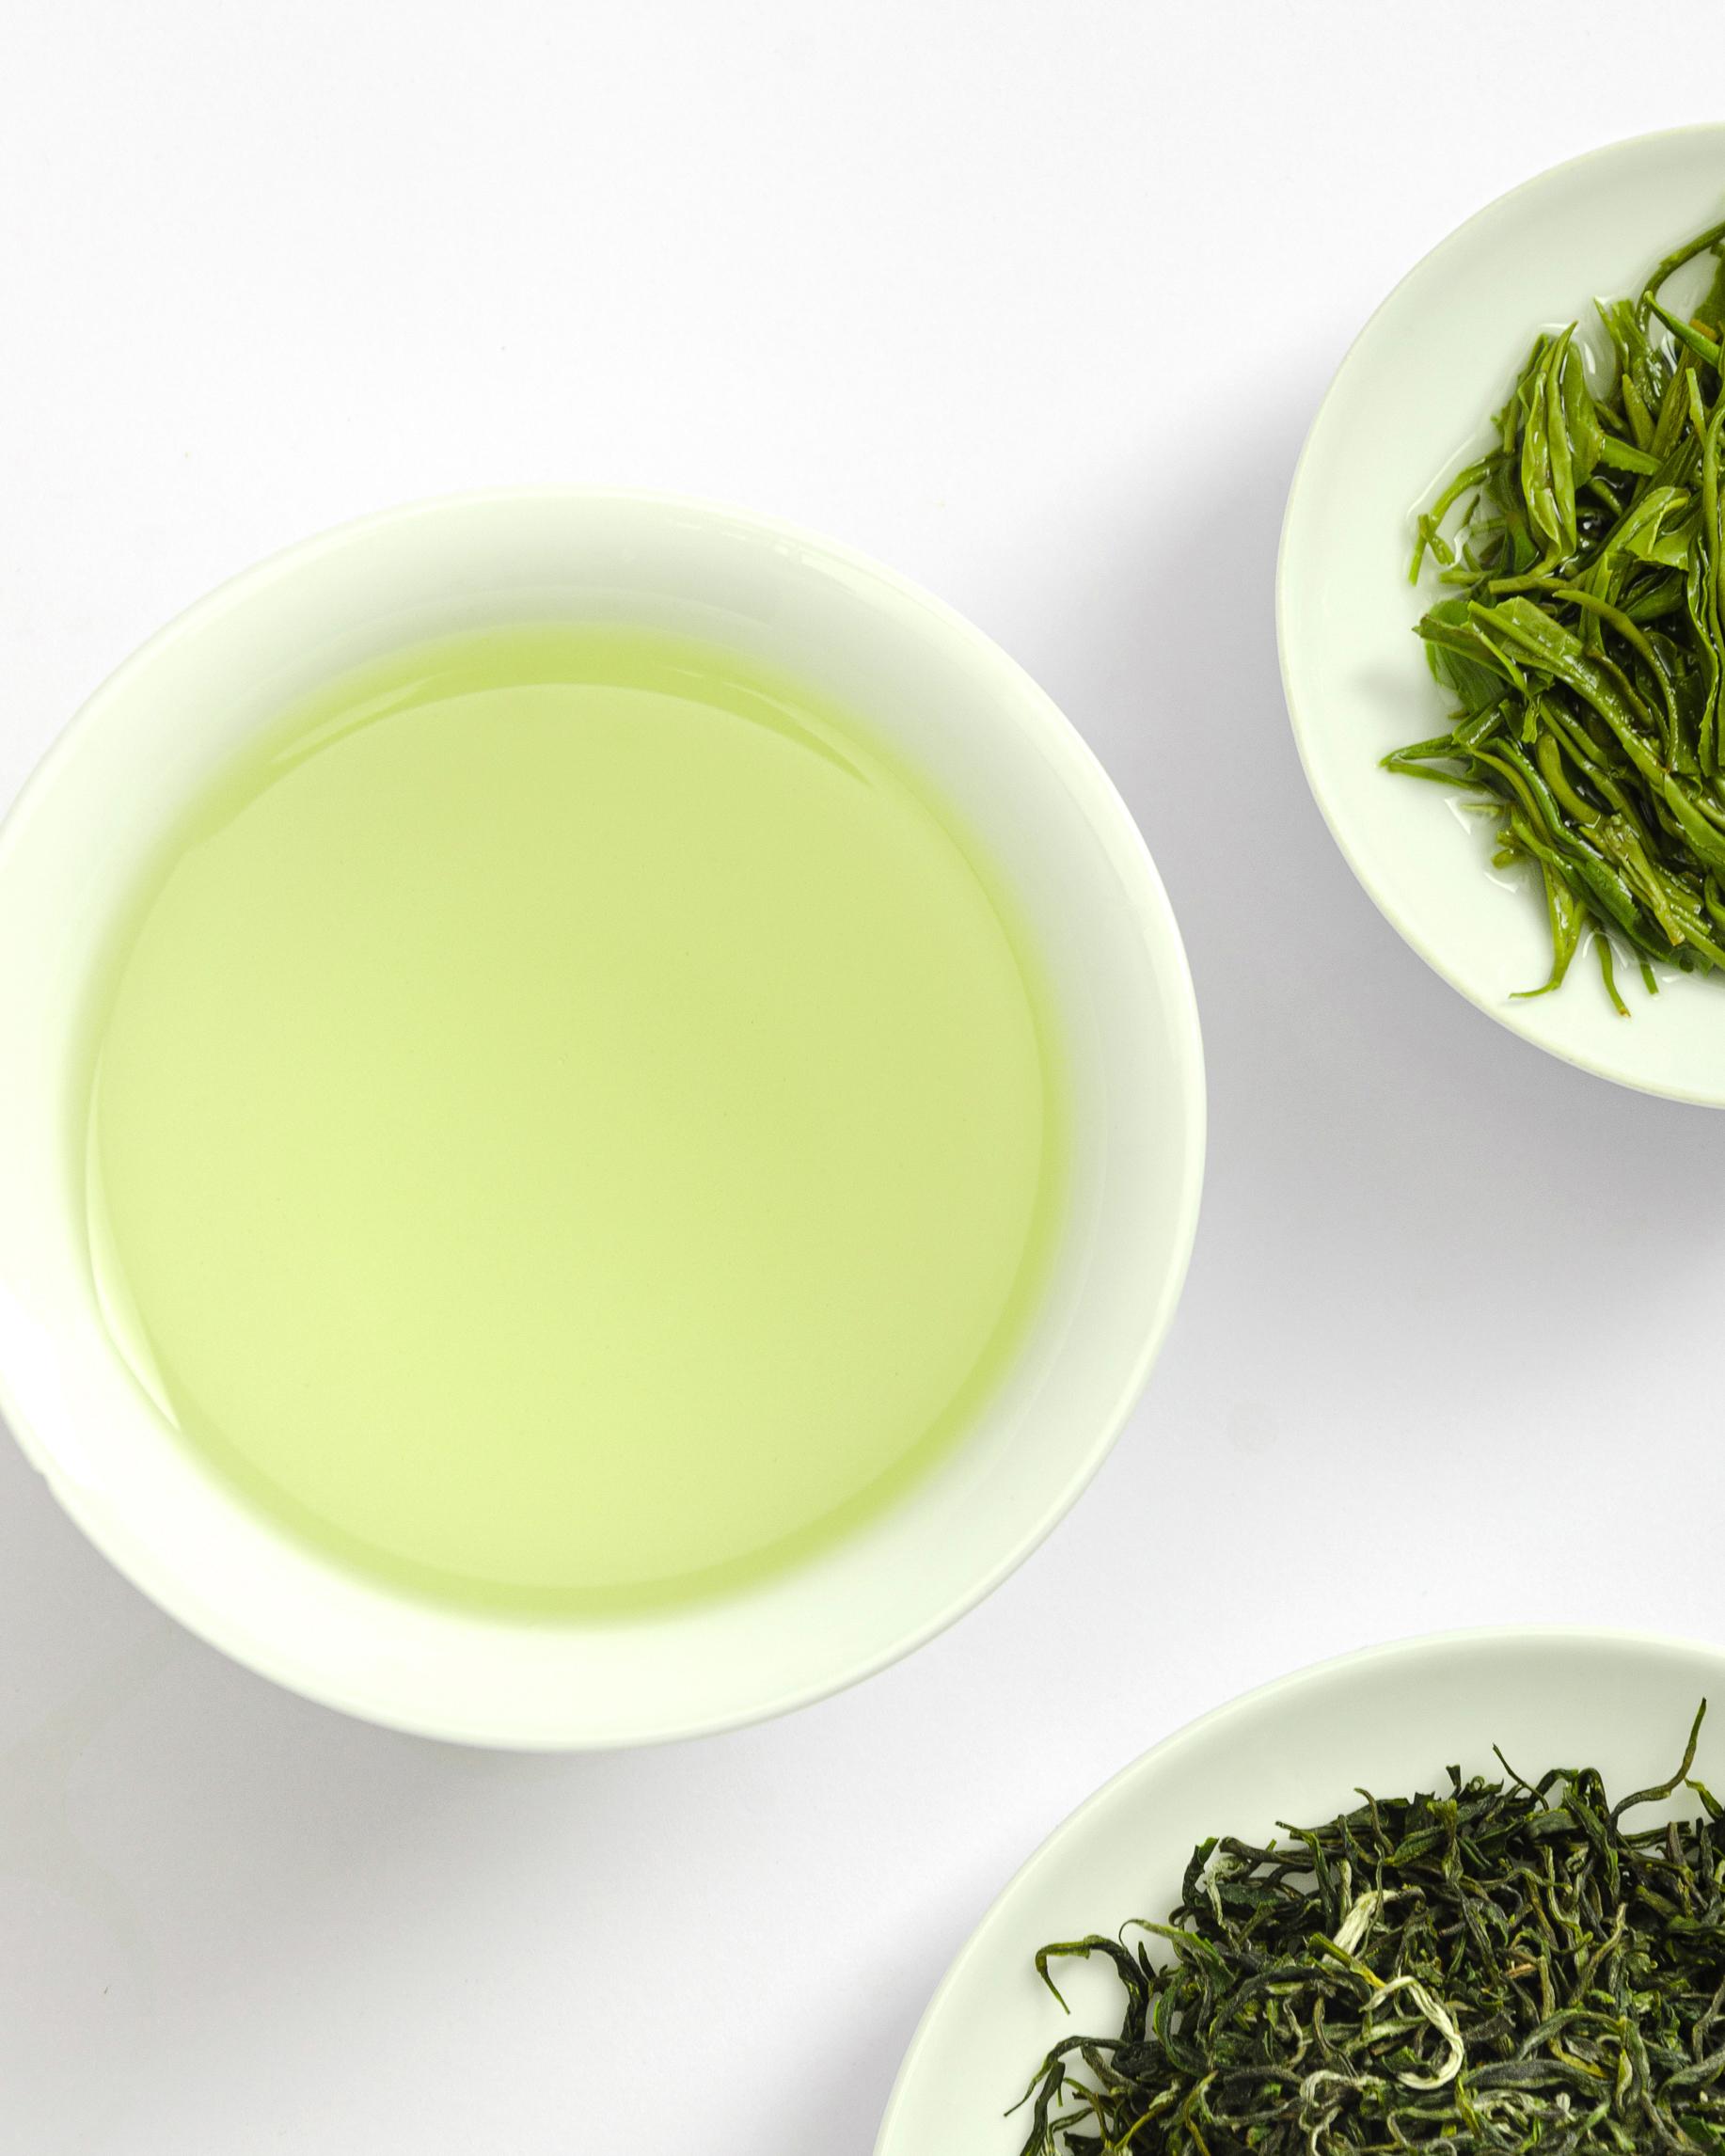 For Health from Chinese Green Tea Bagged Tea Bag Bulk Stir-fried BOX - 4uTea | 4uTea.com